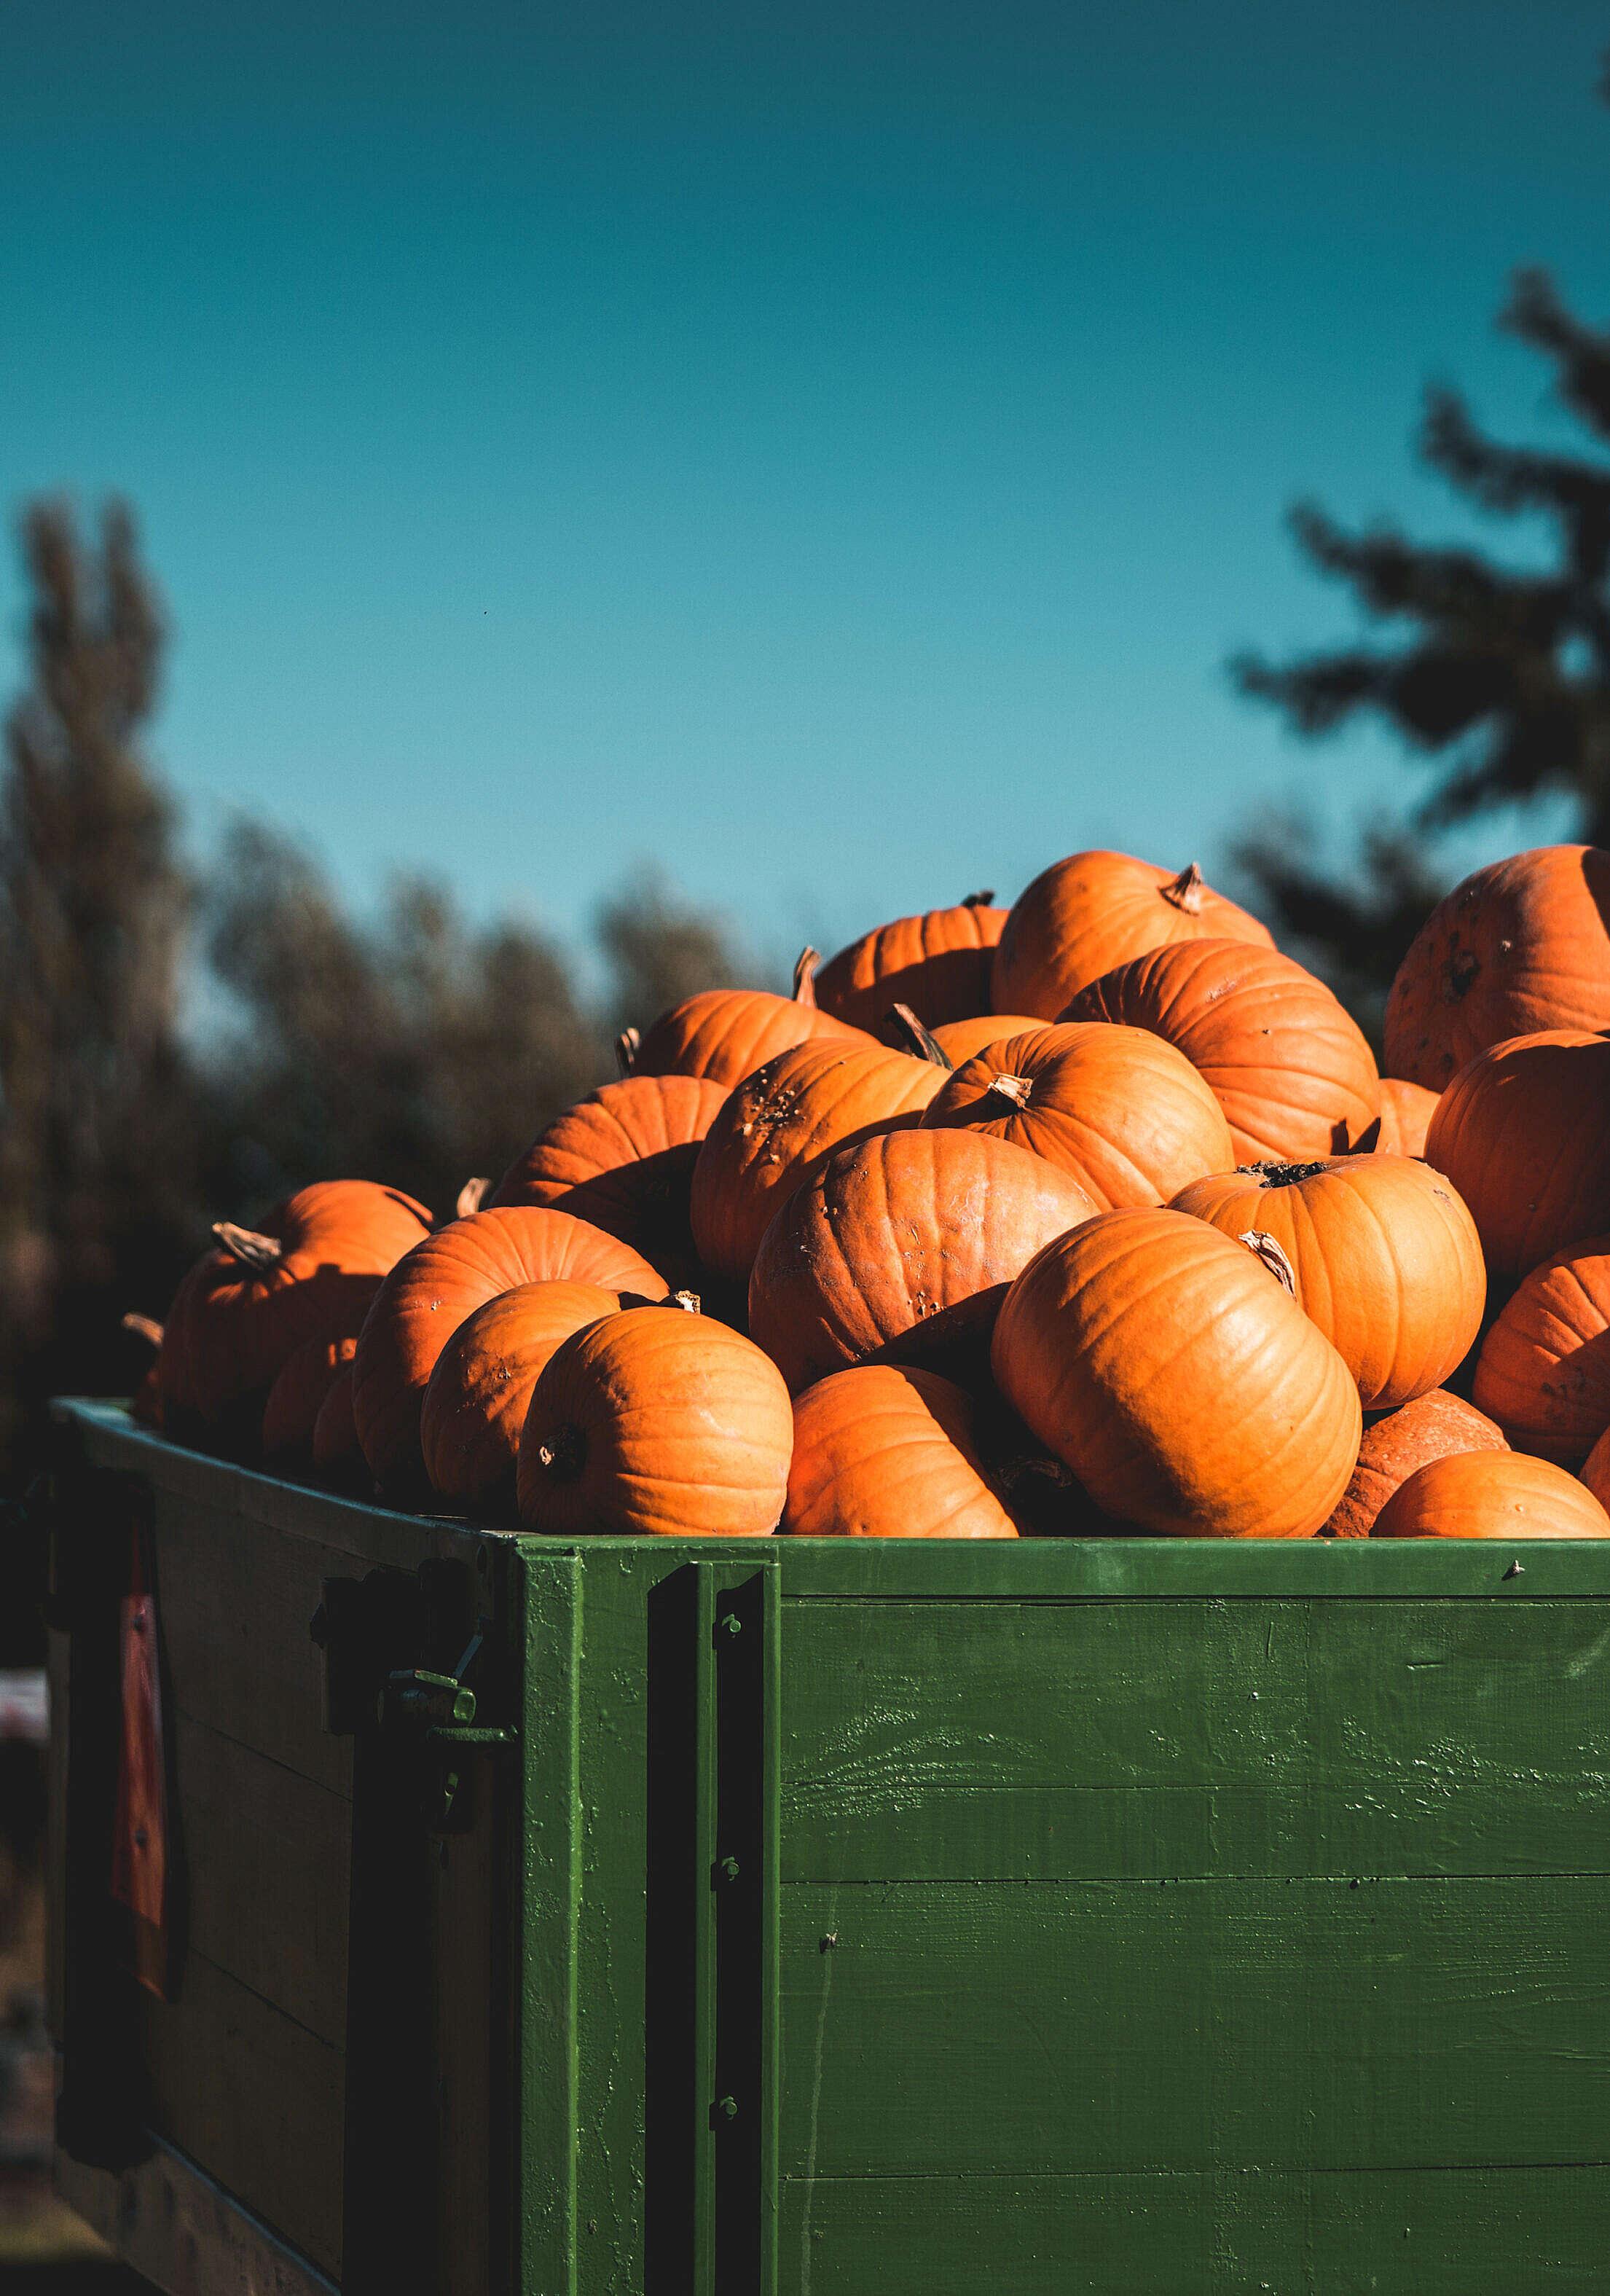 Heap of Pumpkins on The Farm Trailer Free Stock Photo